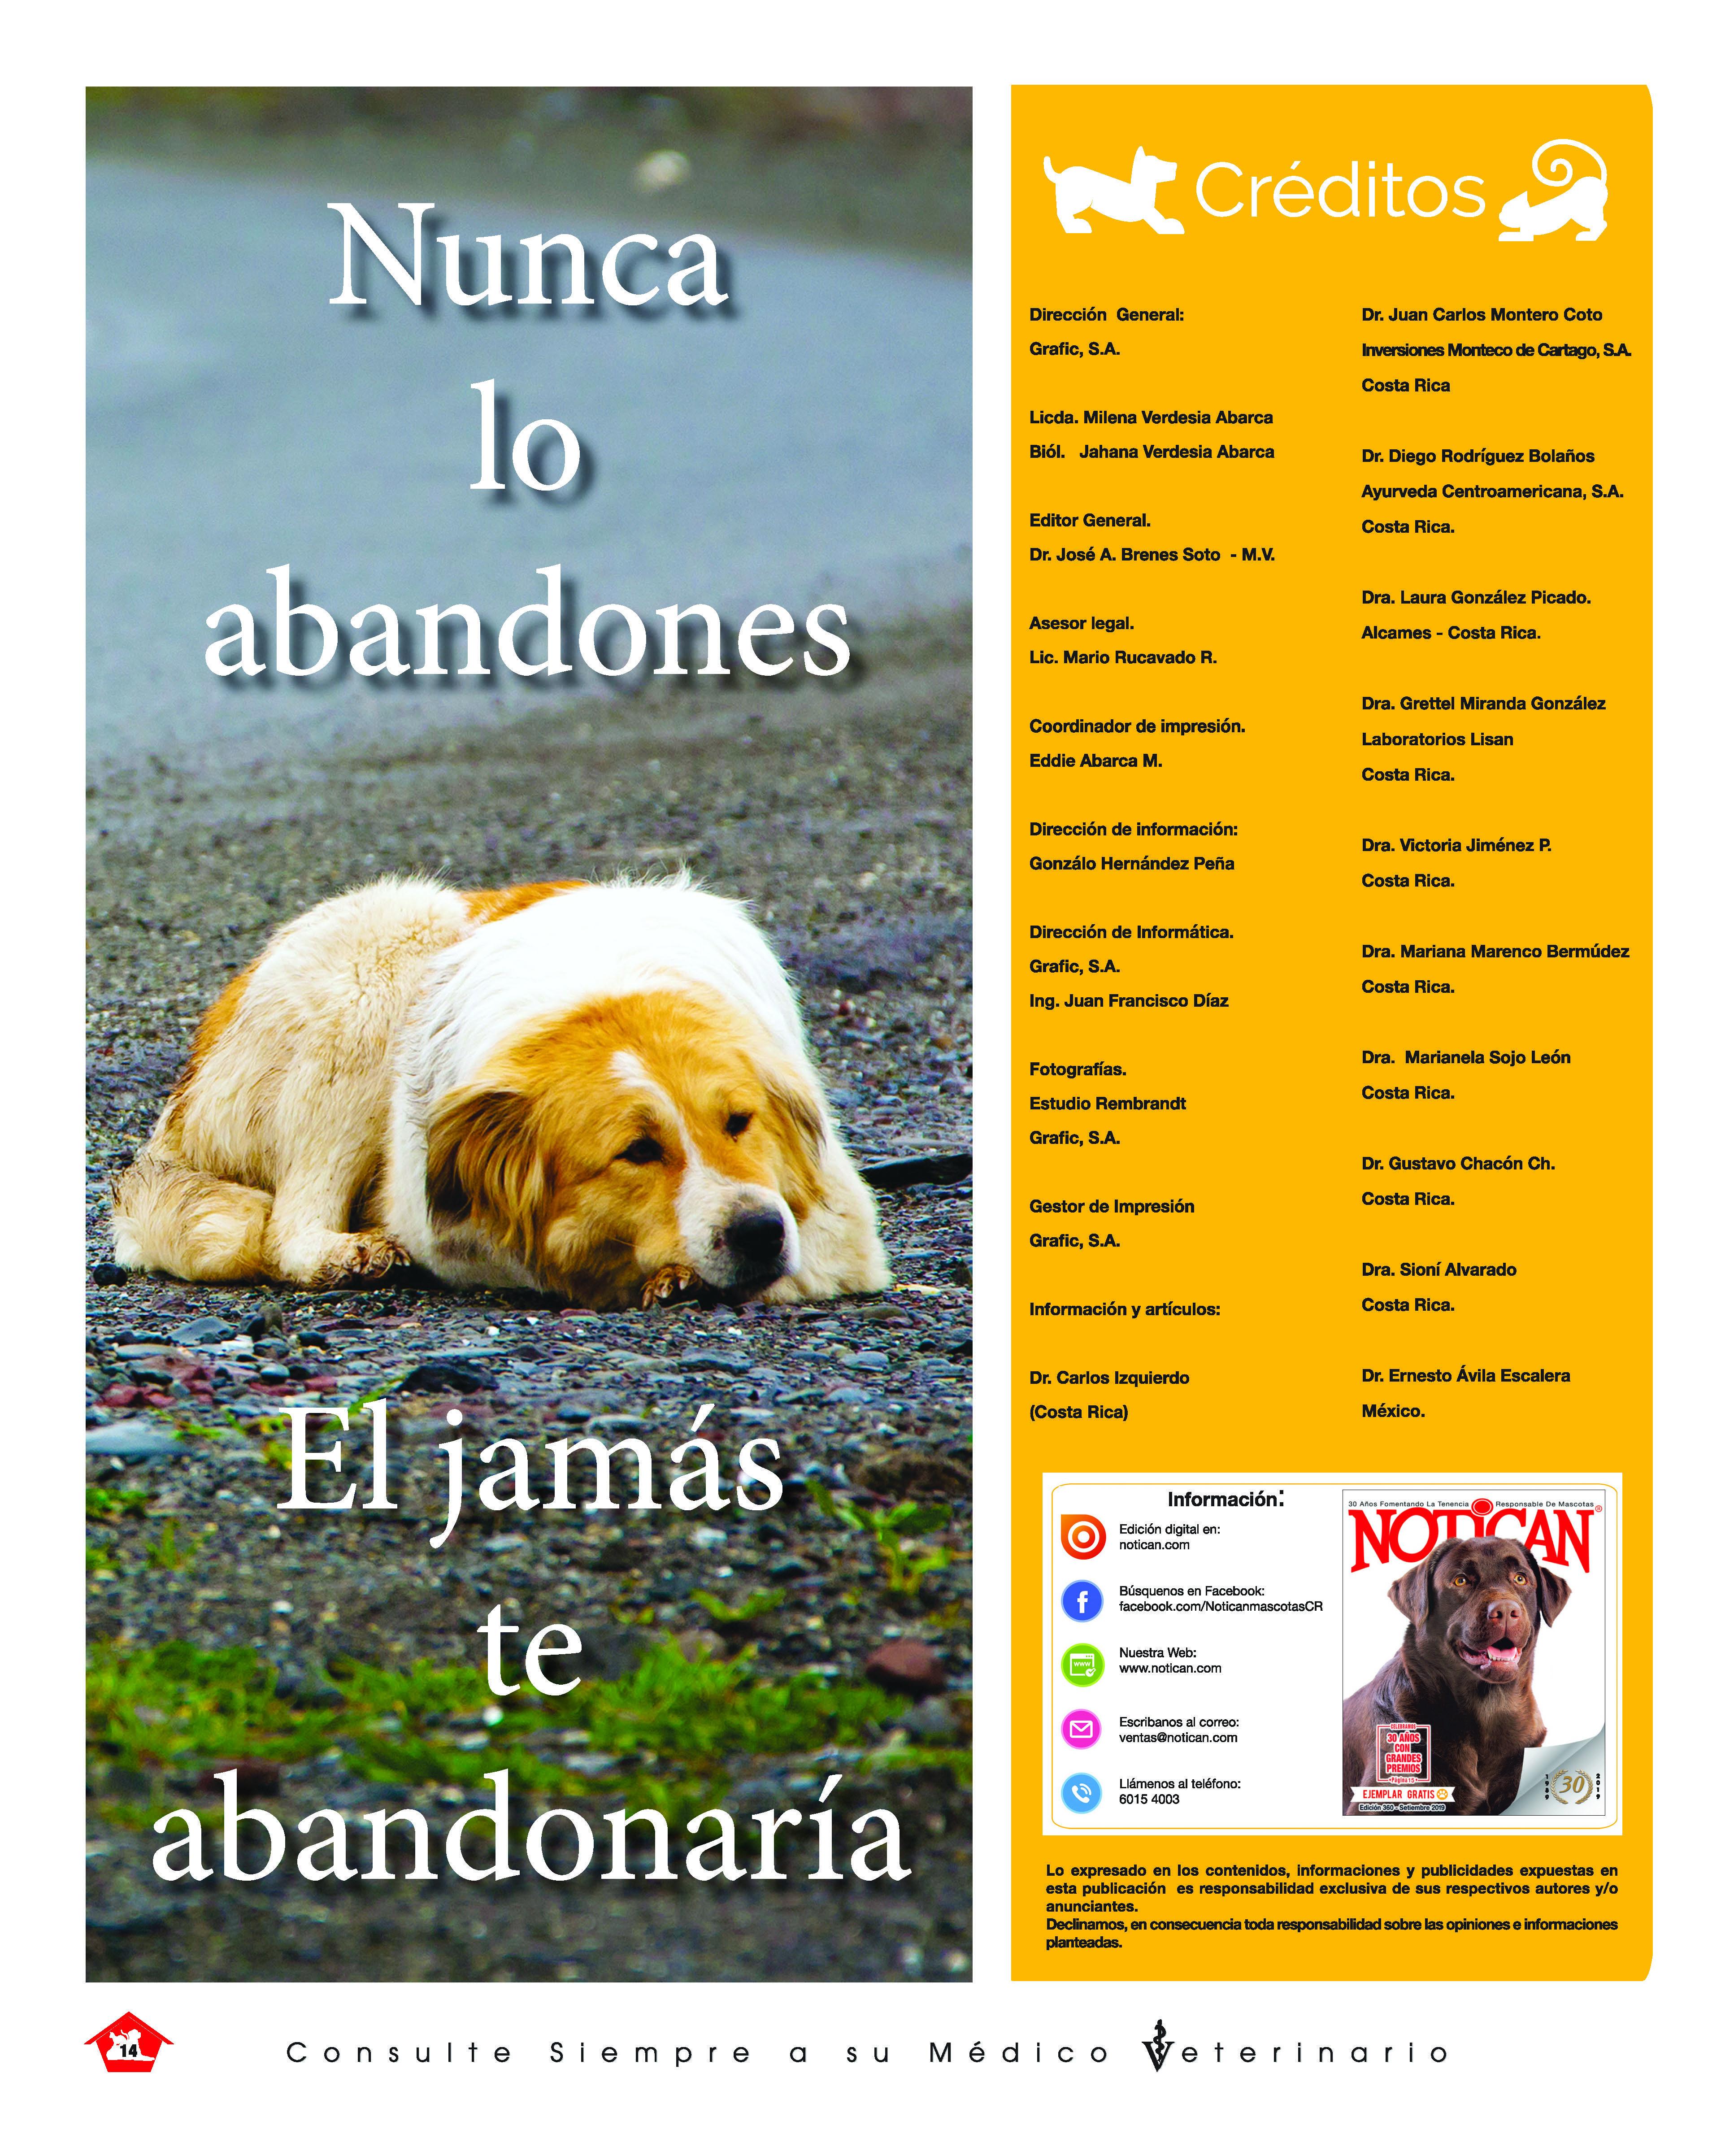 https://www.notican.com/wp-content/uploads/2019/10/Notican-Setiembre-2019-copy_Página_14.jpg